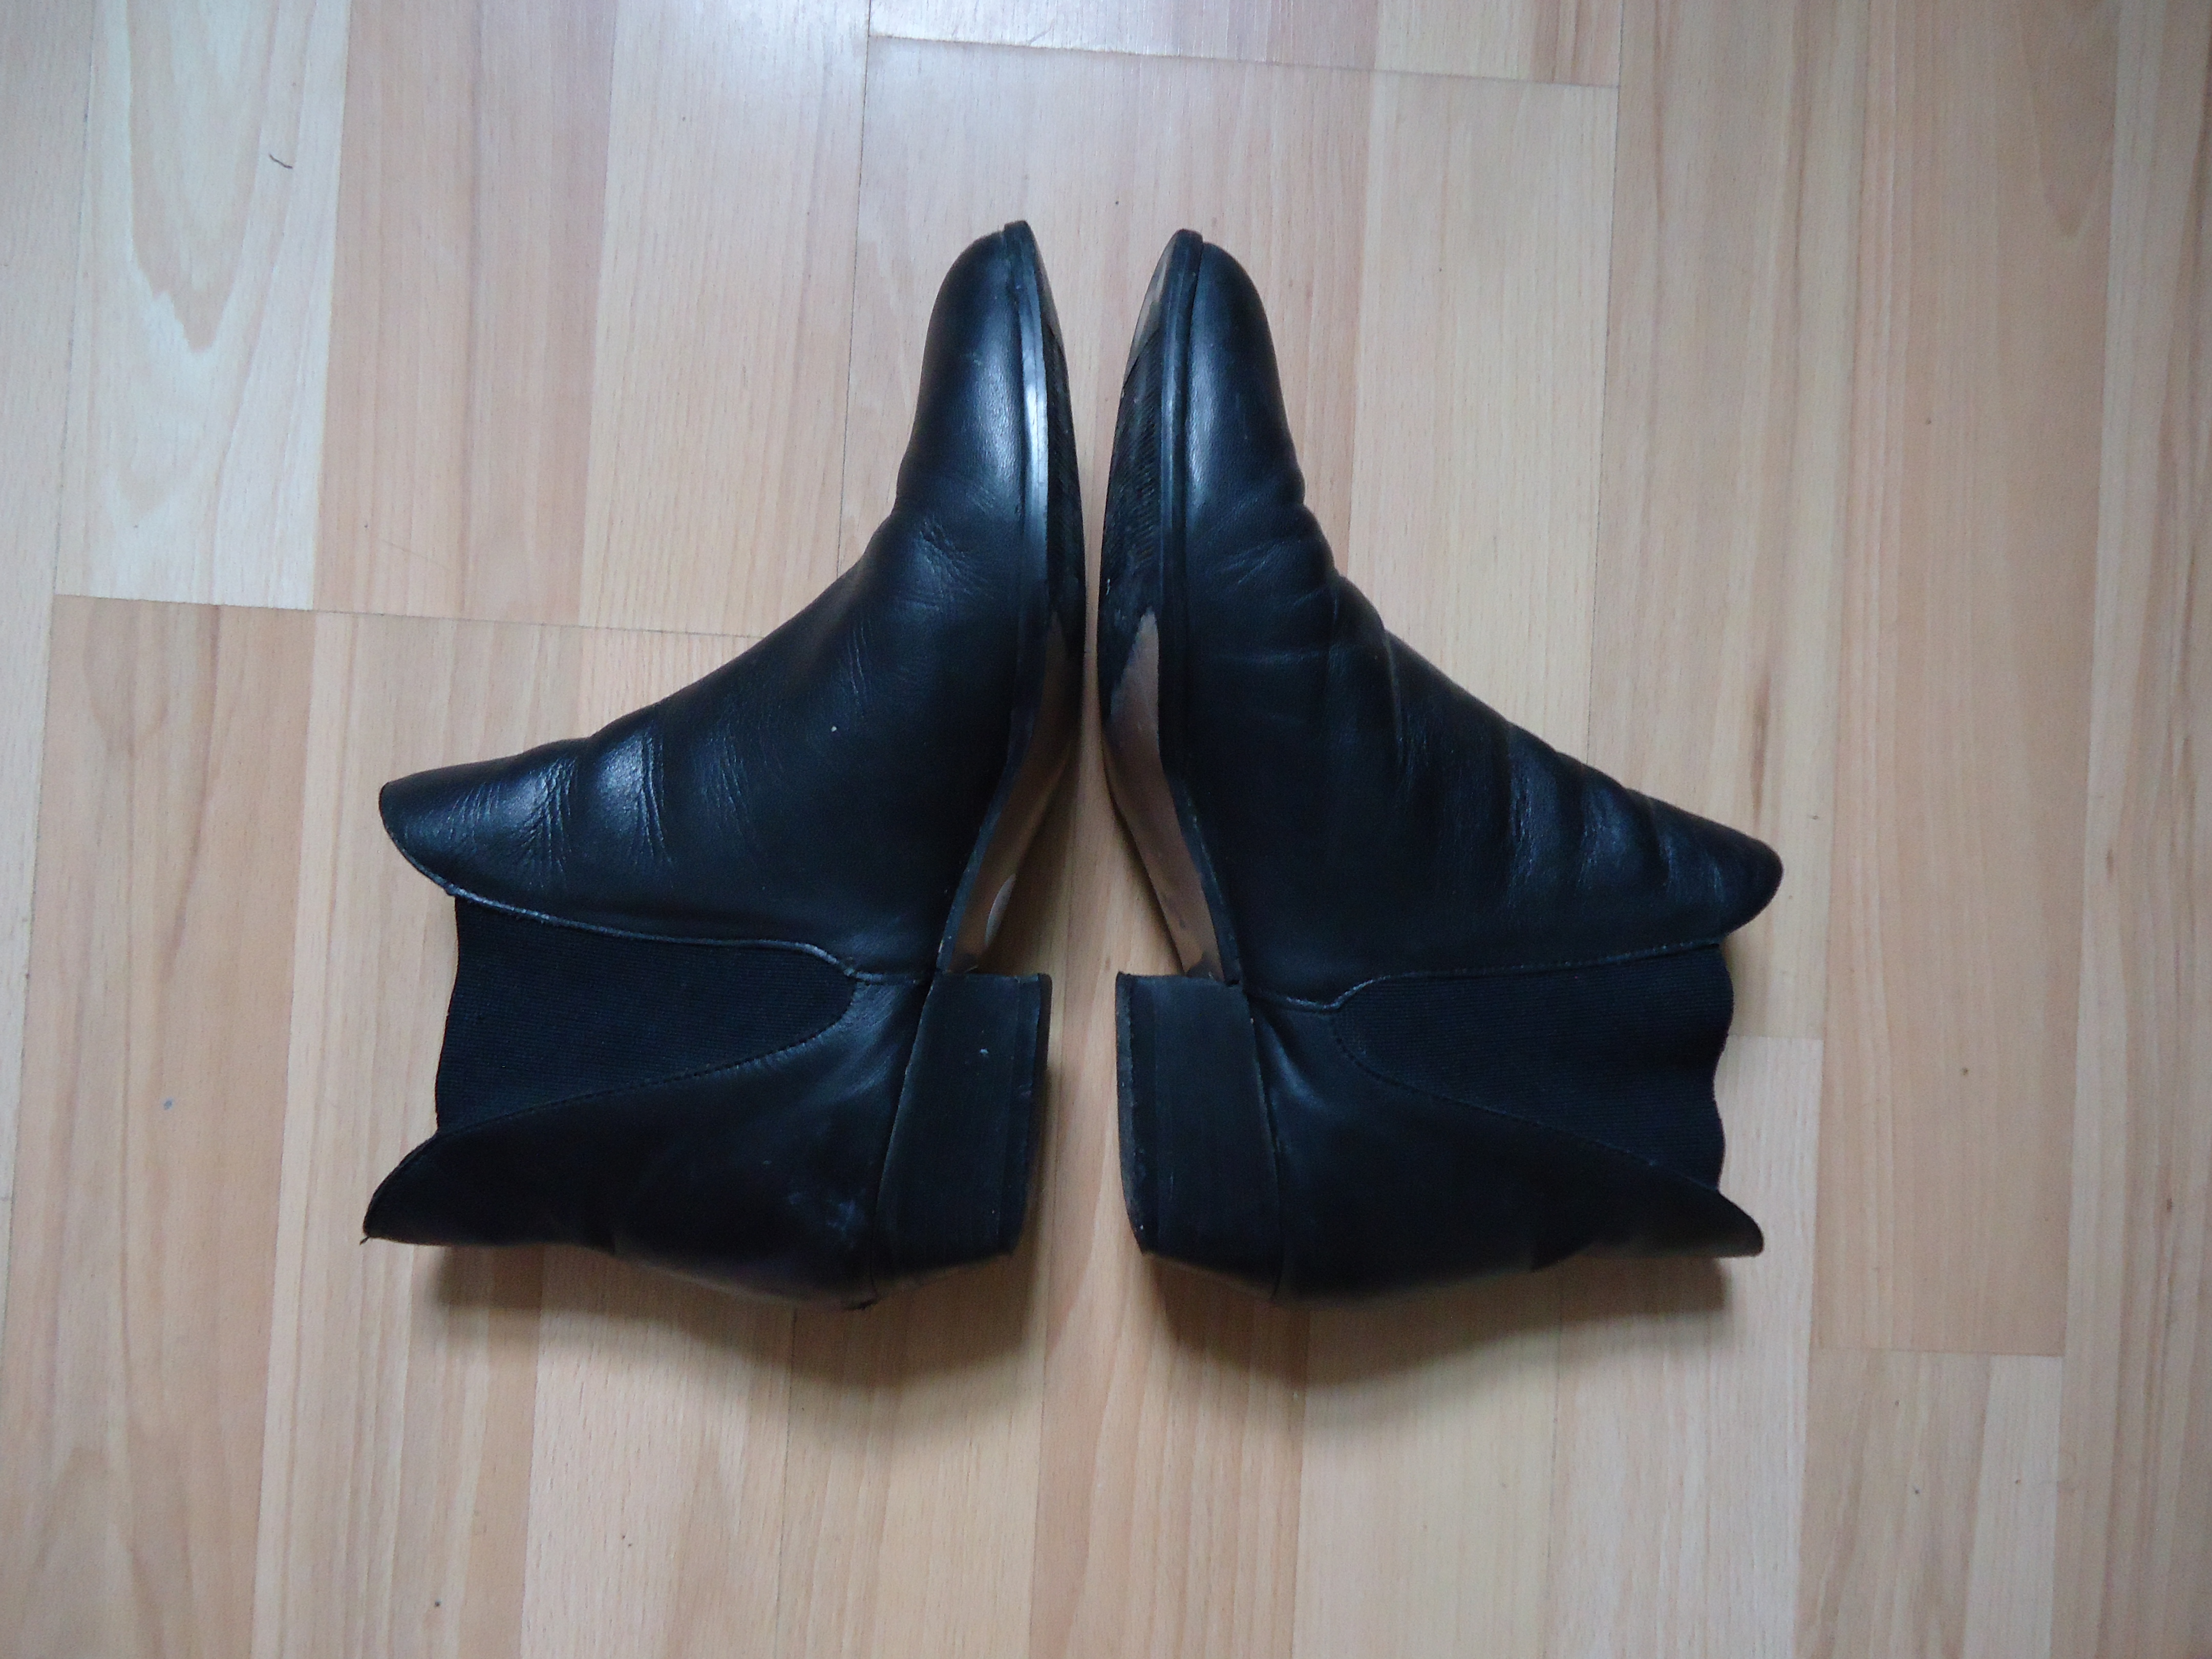 Irene & Irene Vintage Chelsea Boots